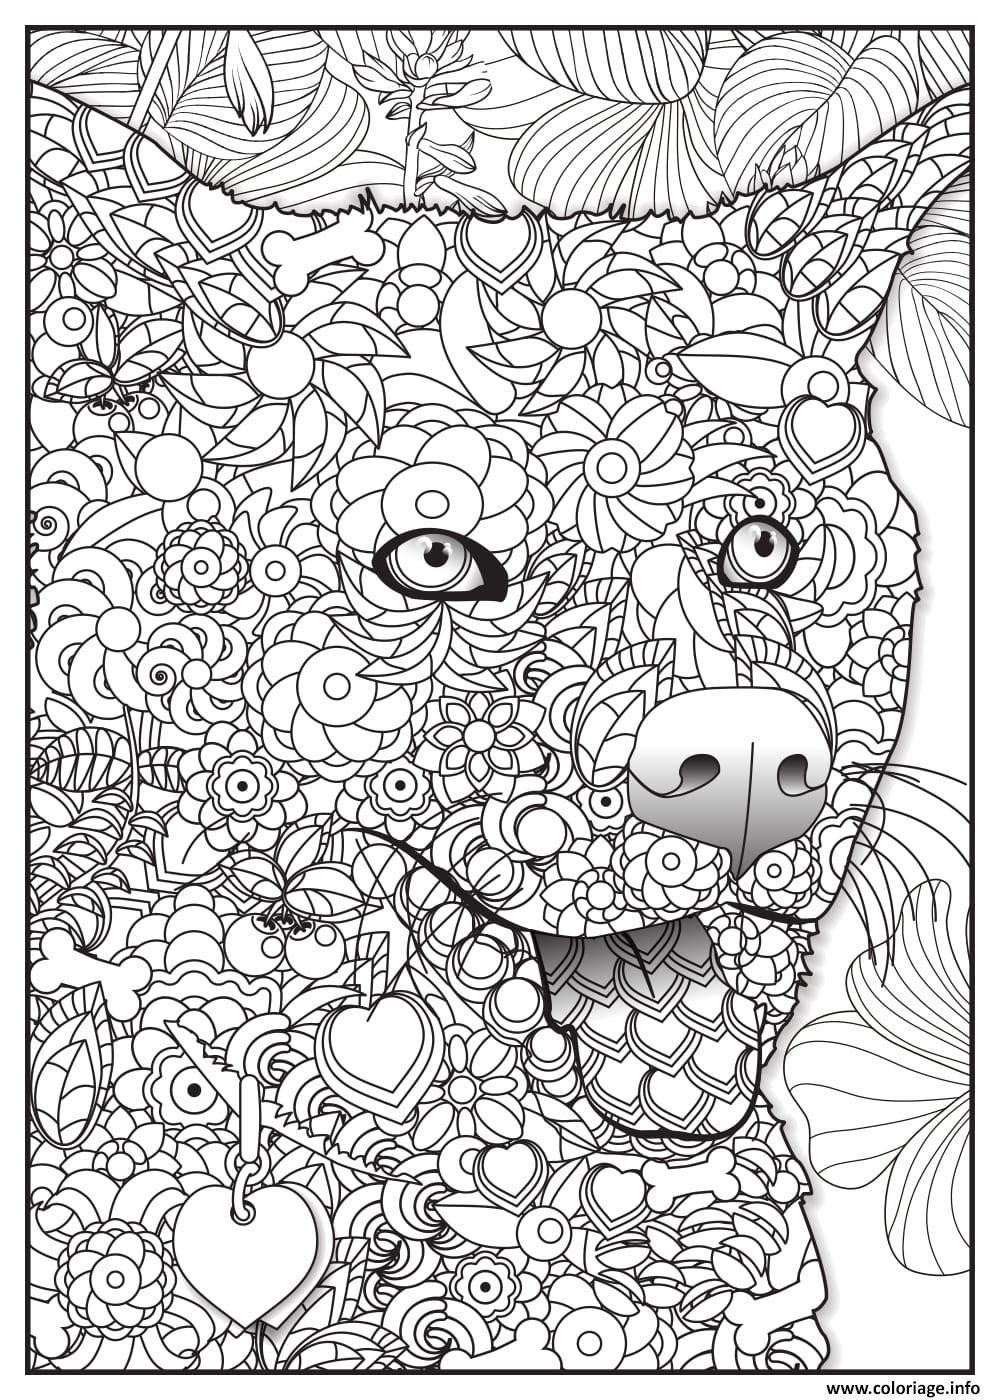 Coloriage renard fox adulte animaux dessin - Coloriage renard a imprimer ...